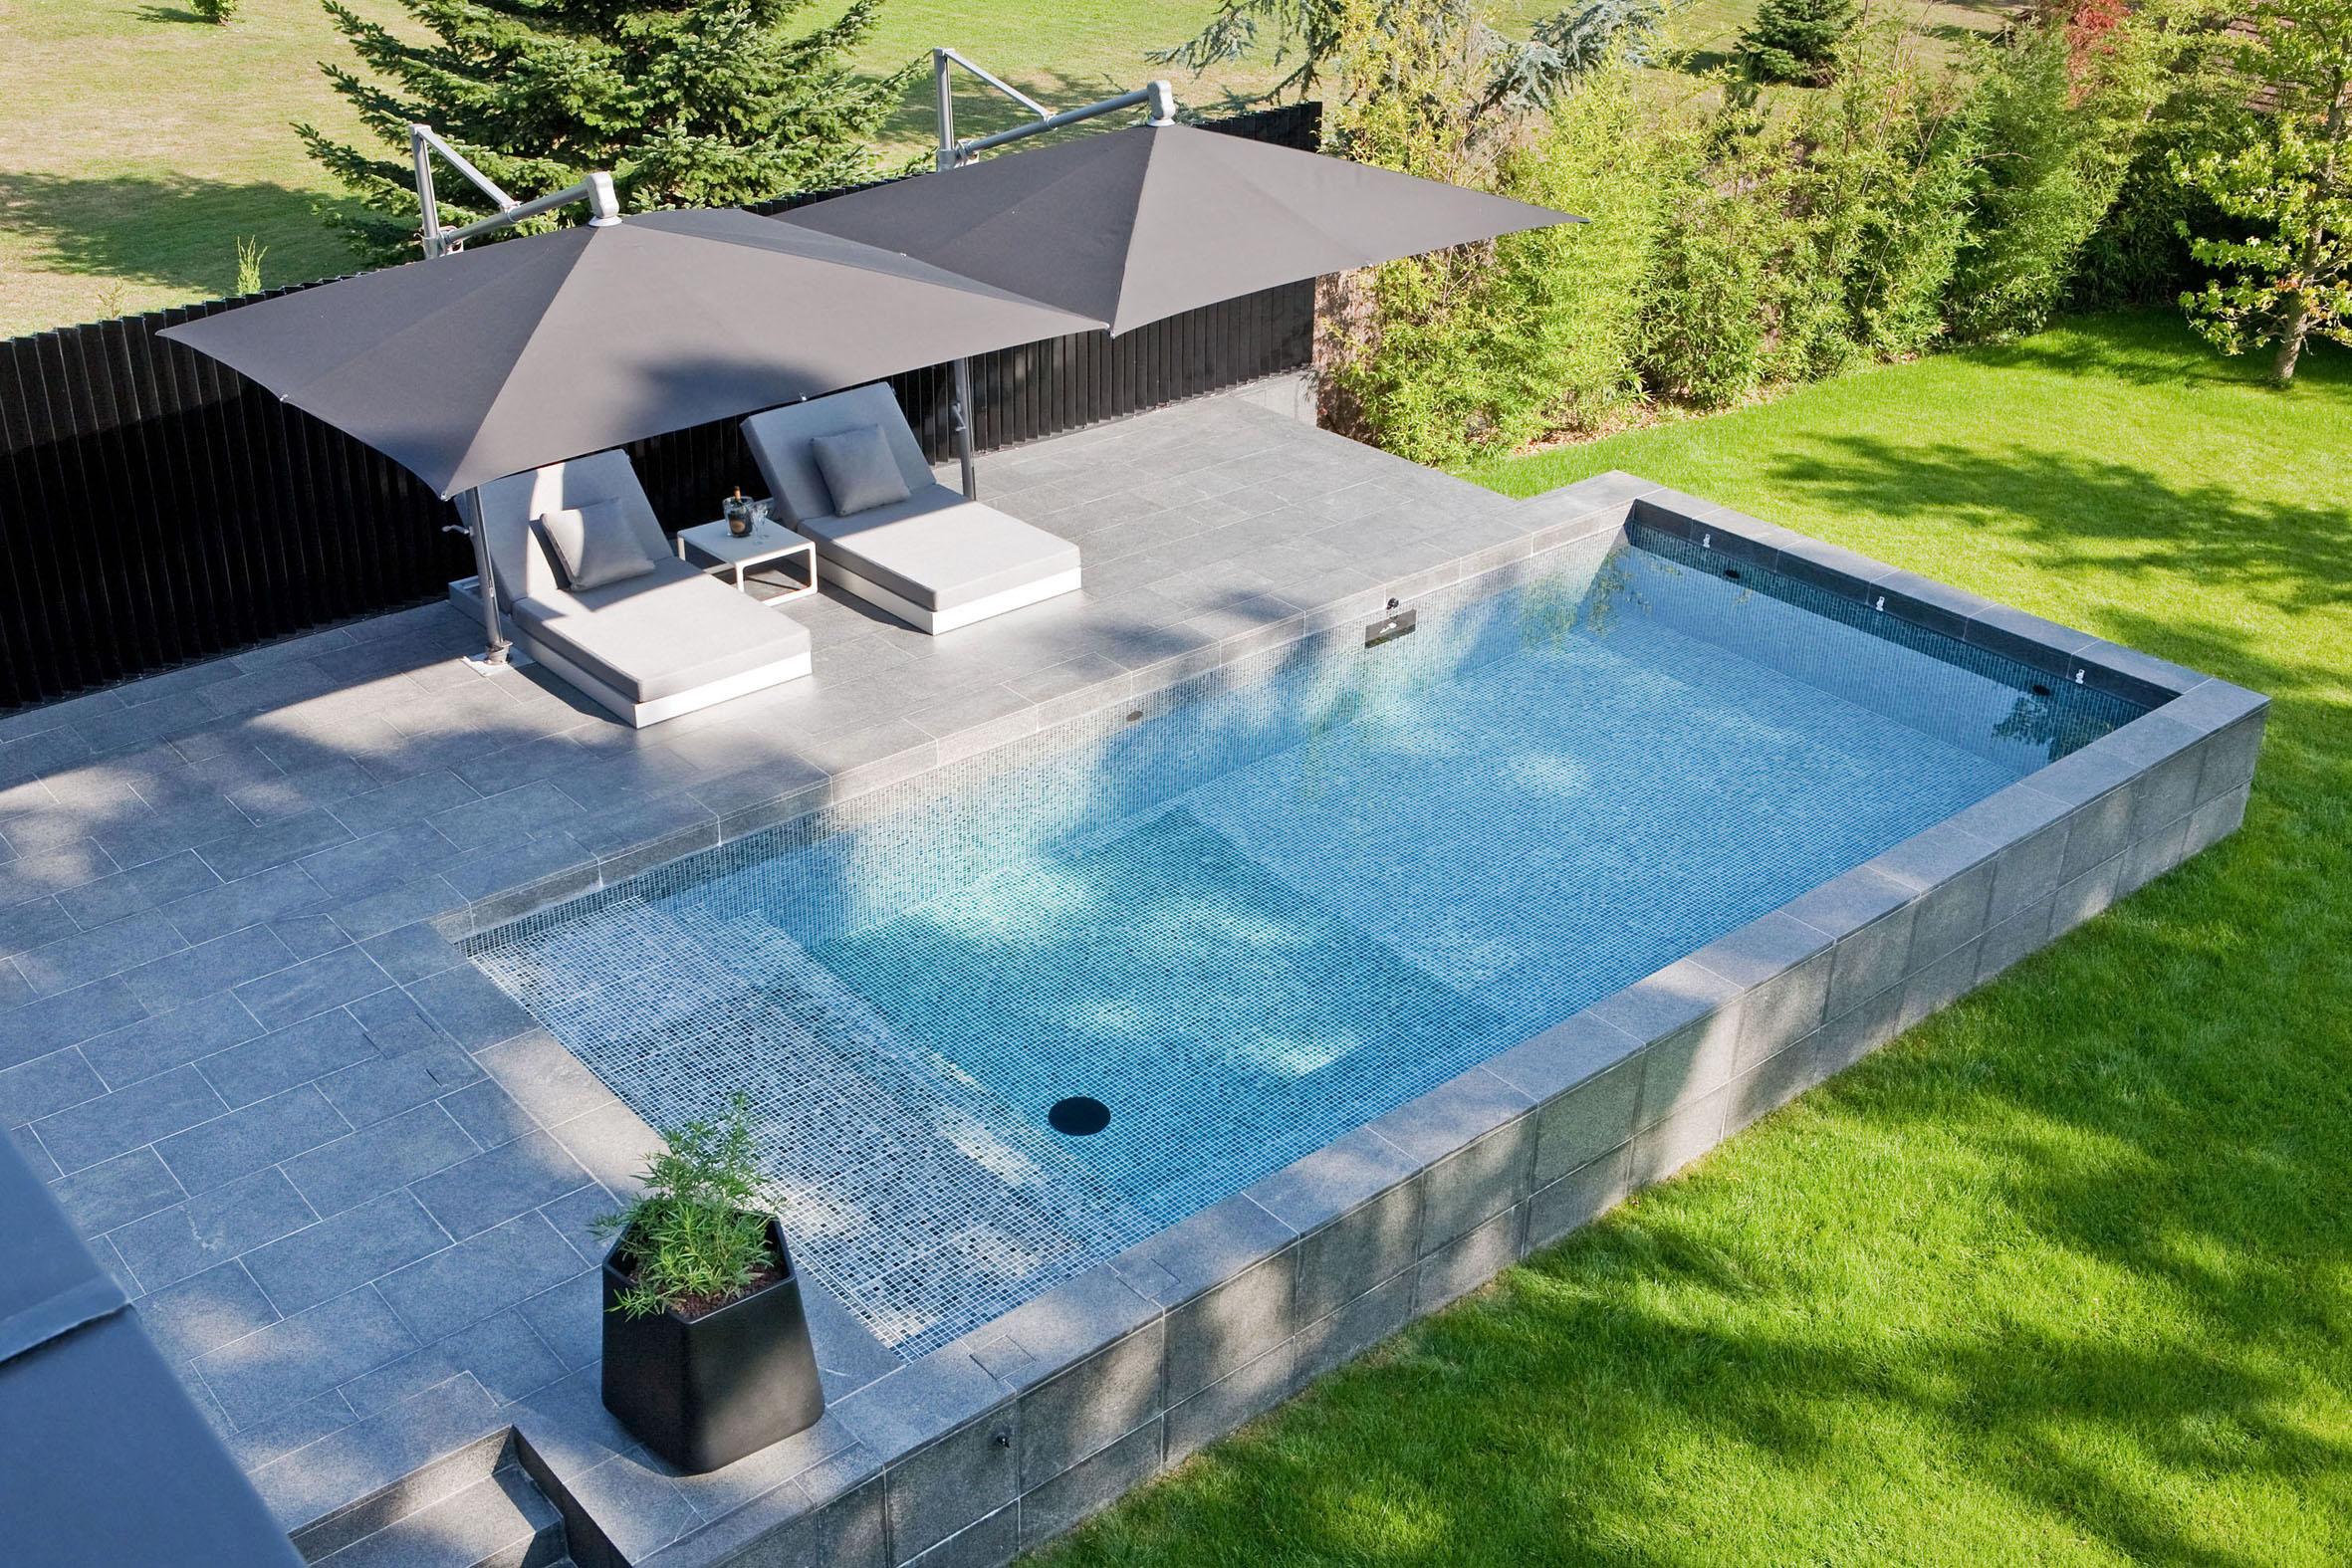 piscine hors sol chauffée